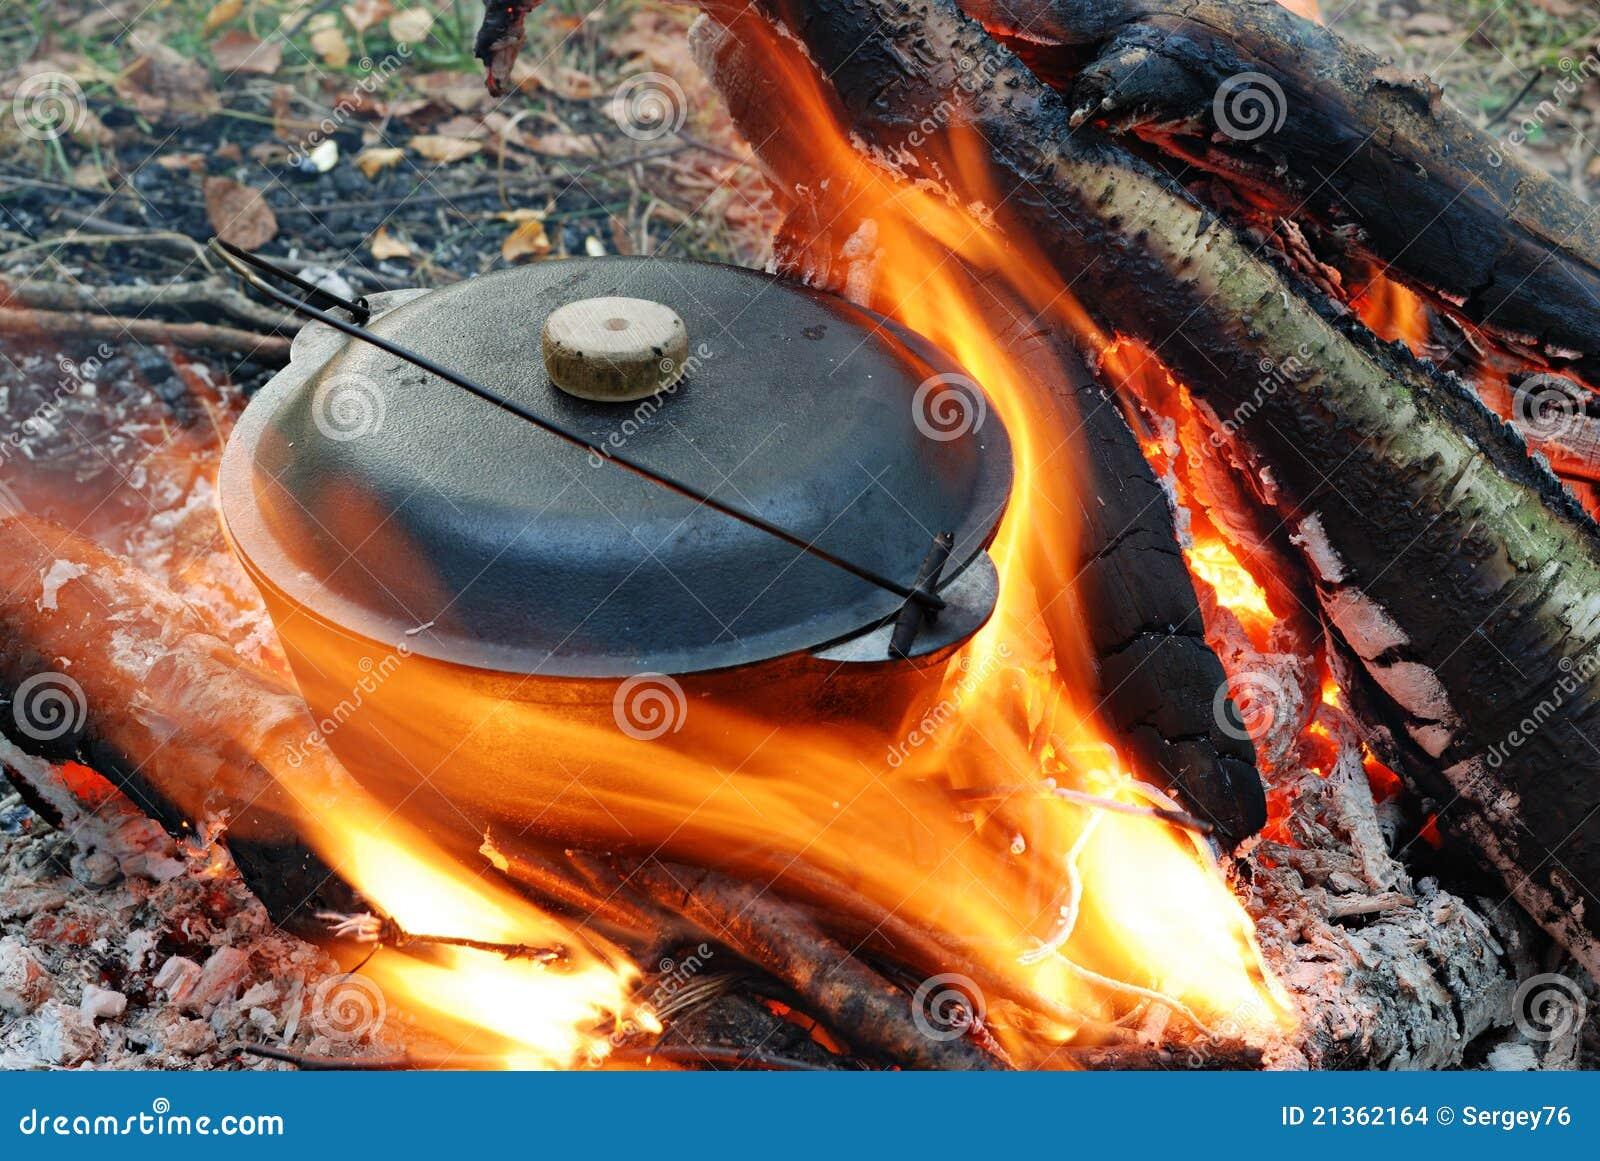 Lägerbrandkruka